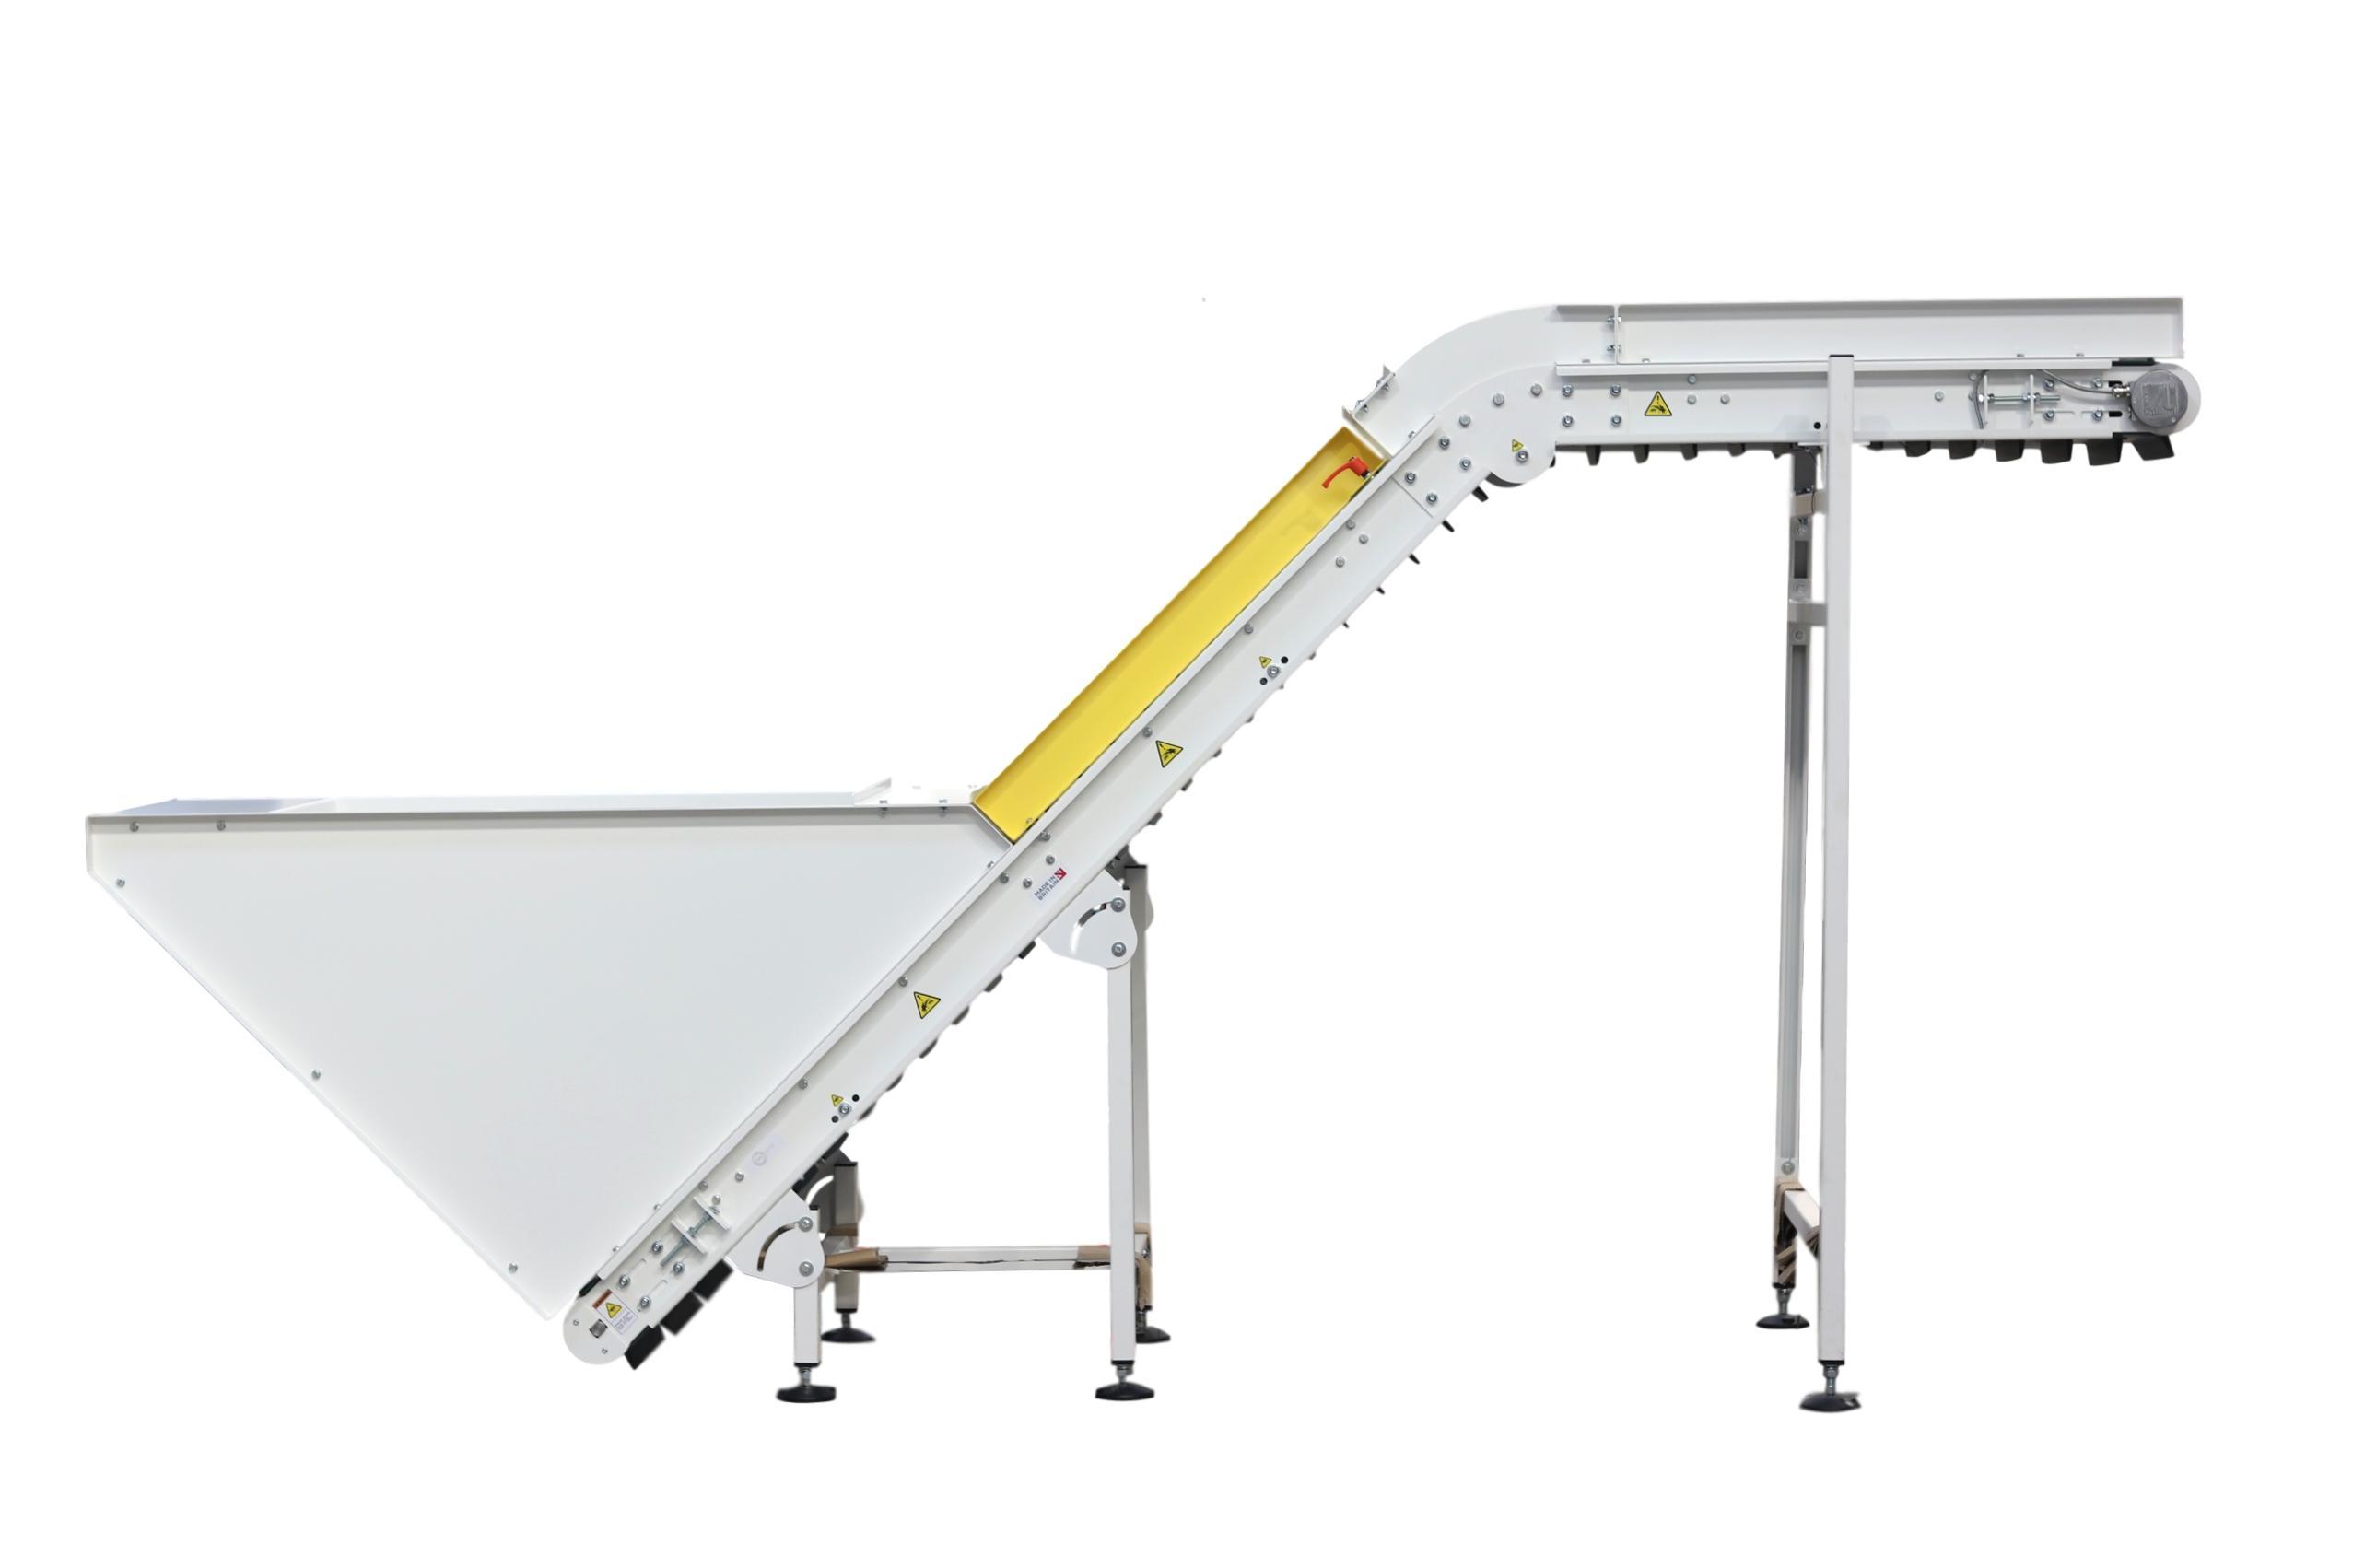 Inclined Elevator Conveyor Incline Belt Conveyor with Flights Cleated Belt Incline Nose Over